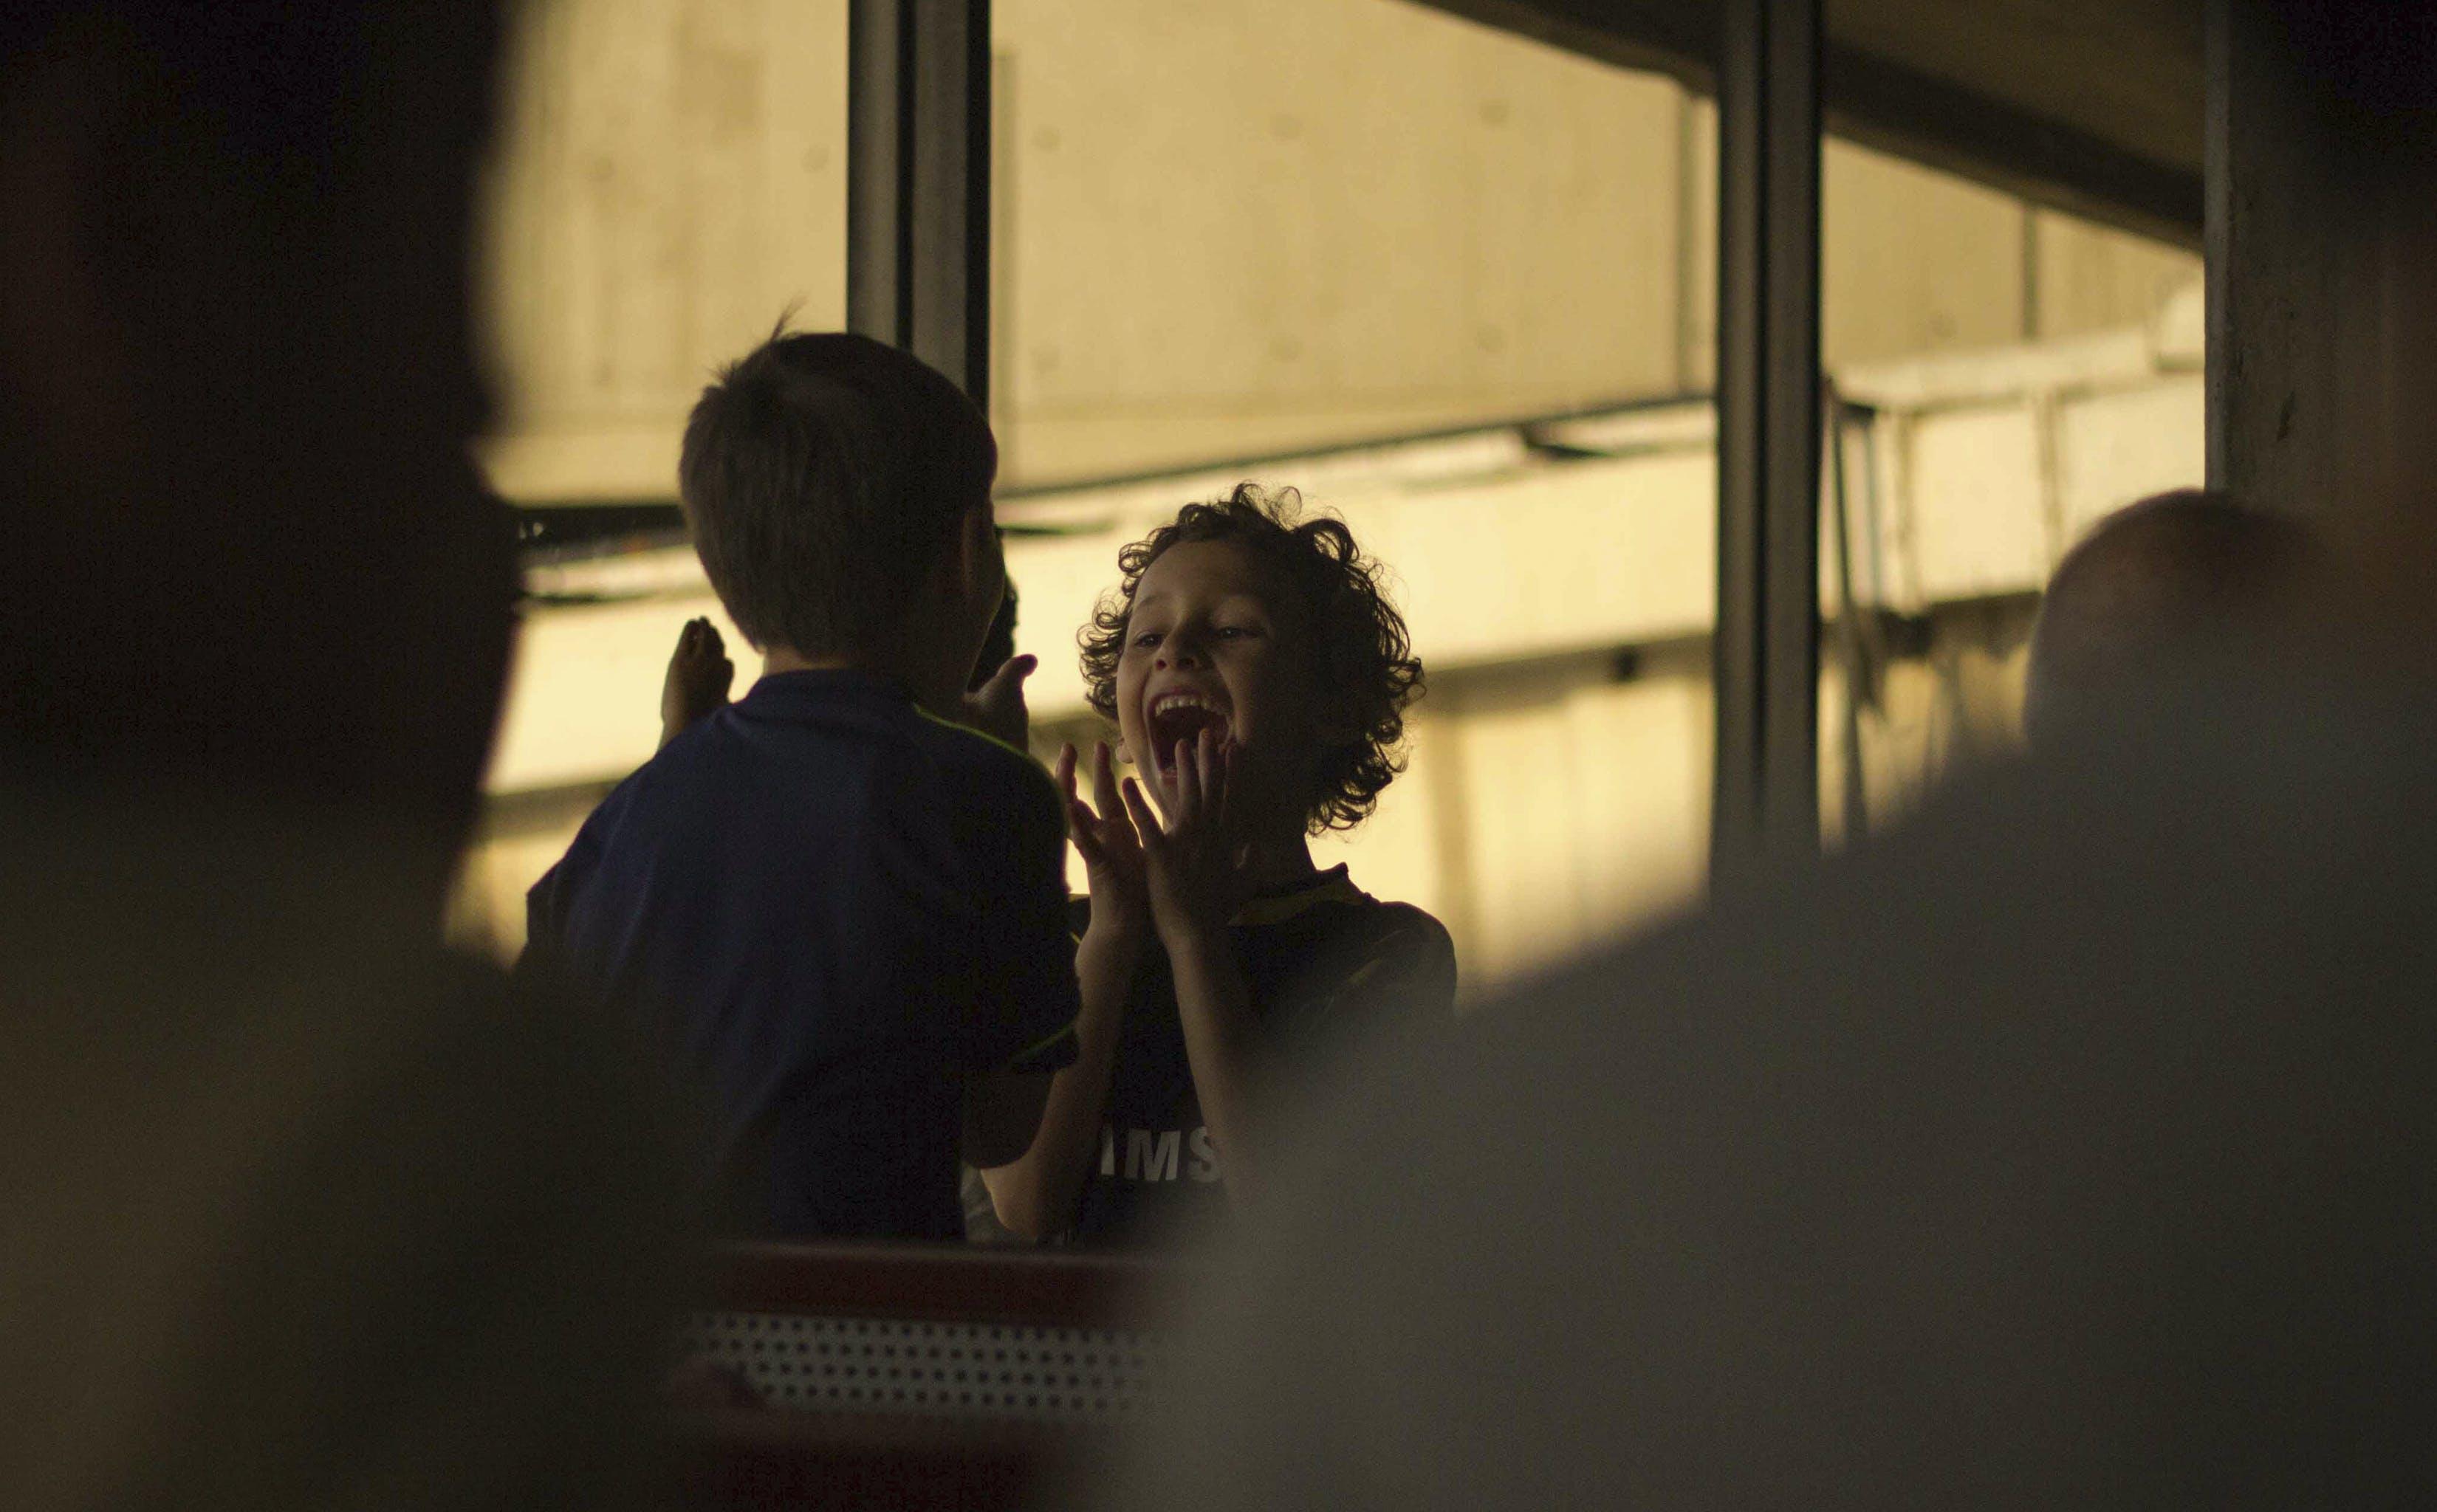 of airport, child, children, emotional